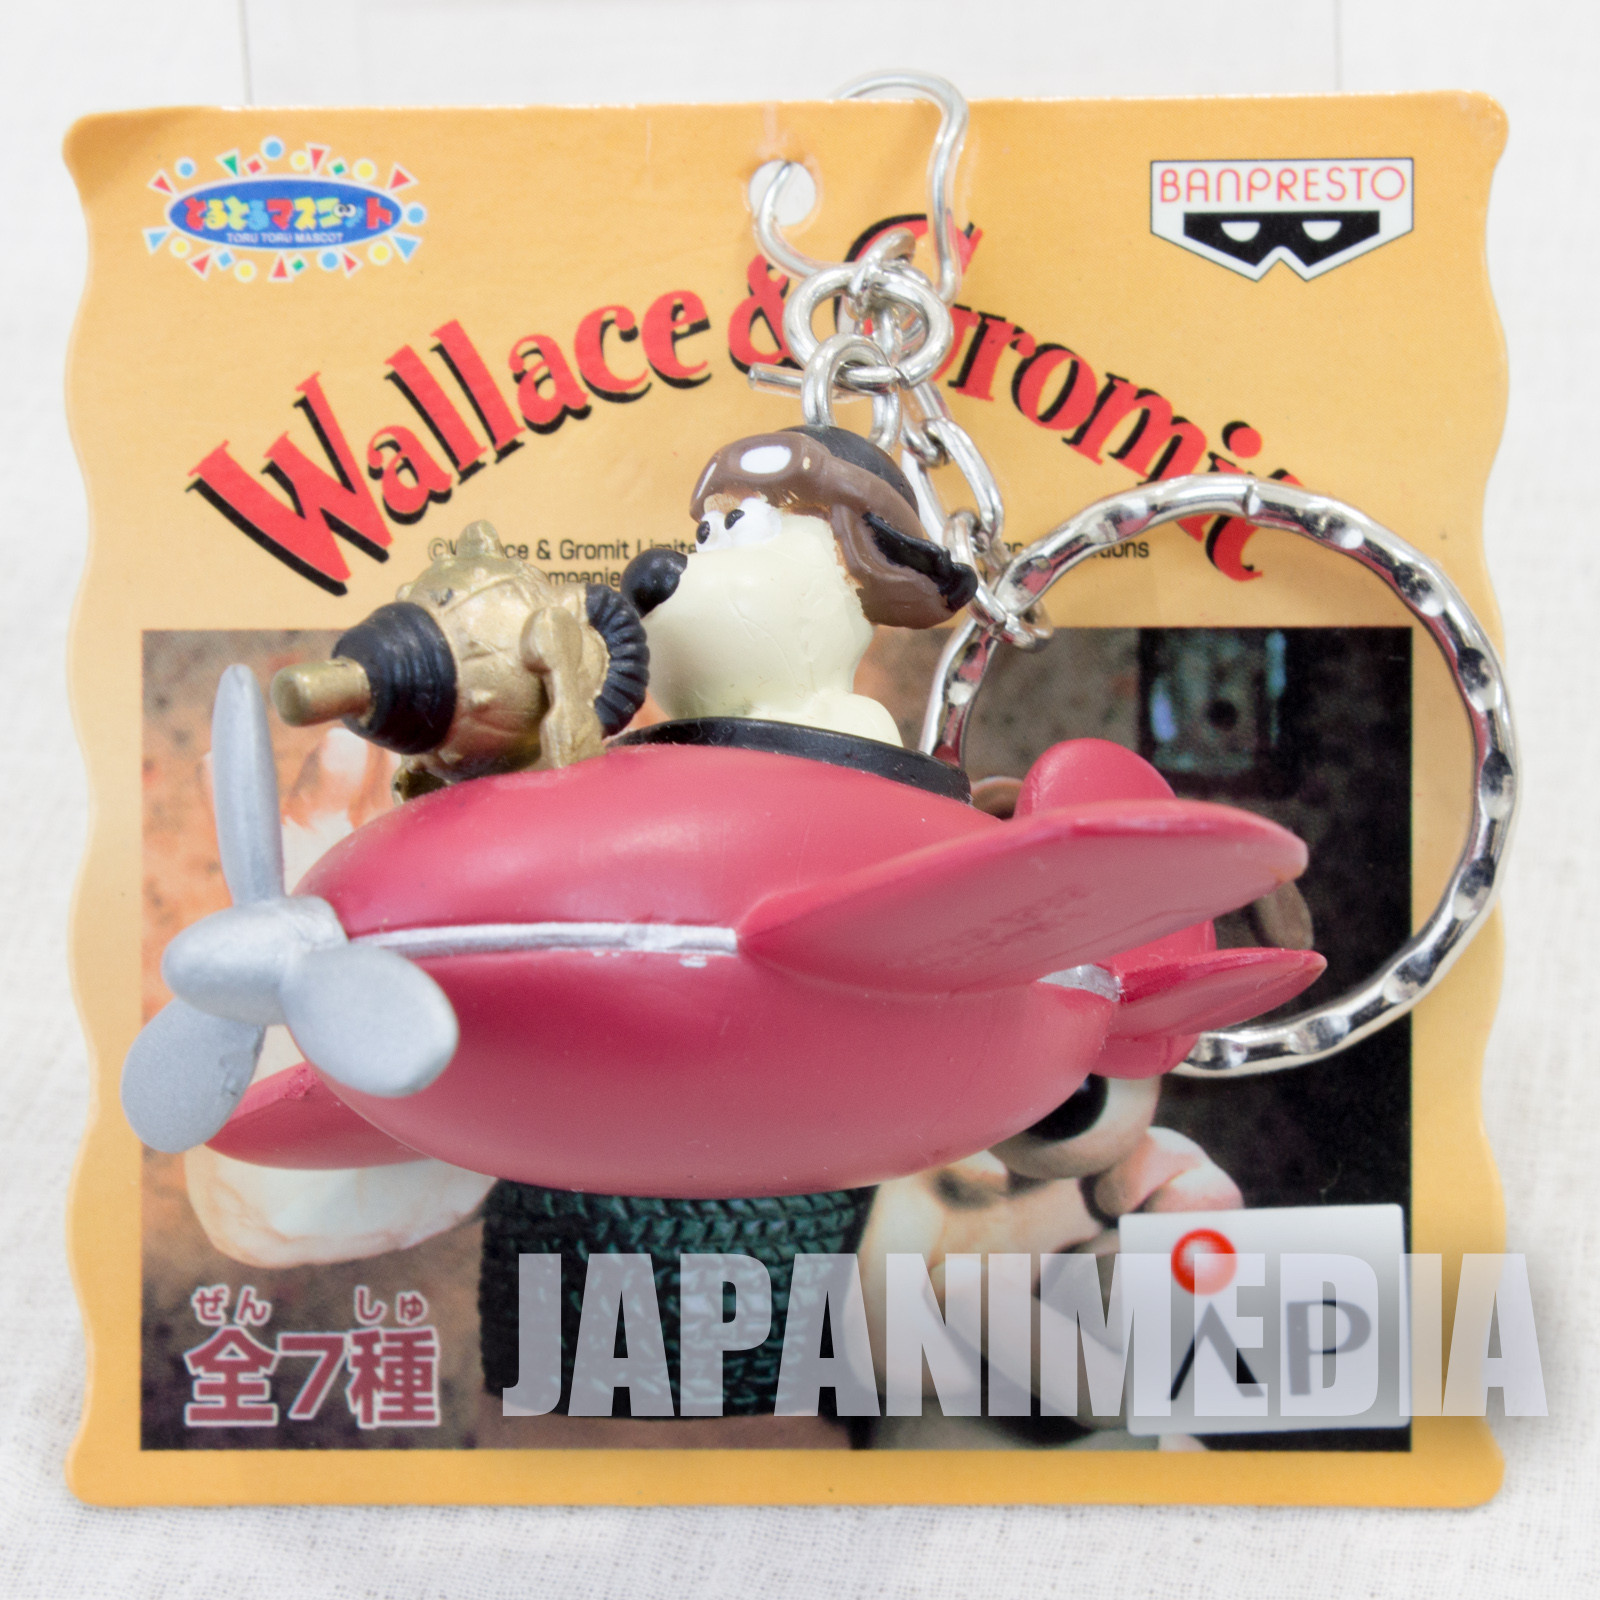 Wallace & Gromit Gromit on Airplane Figure Key Chain Banpresto JAPAN Ardman